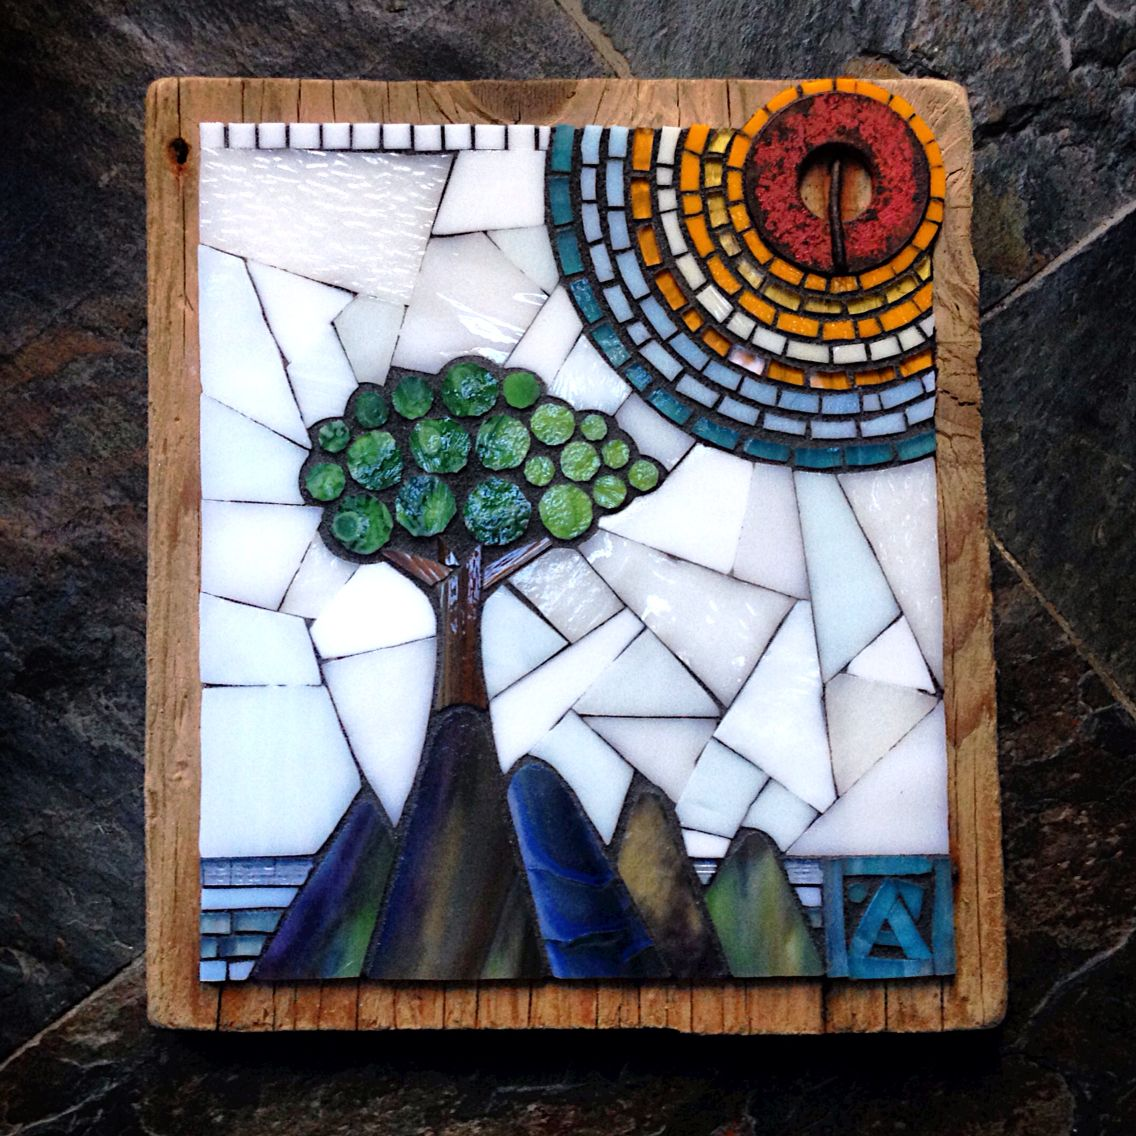 Anne Marie Price mosaic #mosaic #AnneMariePrice #AMPart #AMP #stainedglass #tree #island #LA #CA